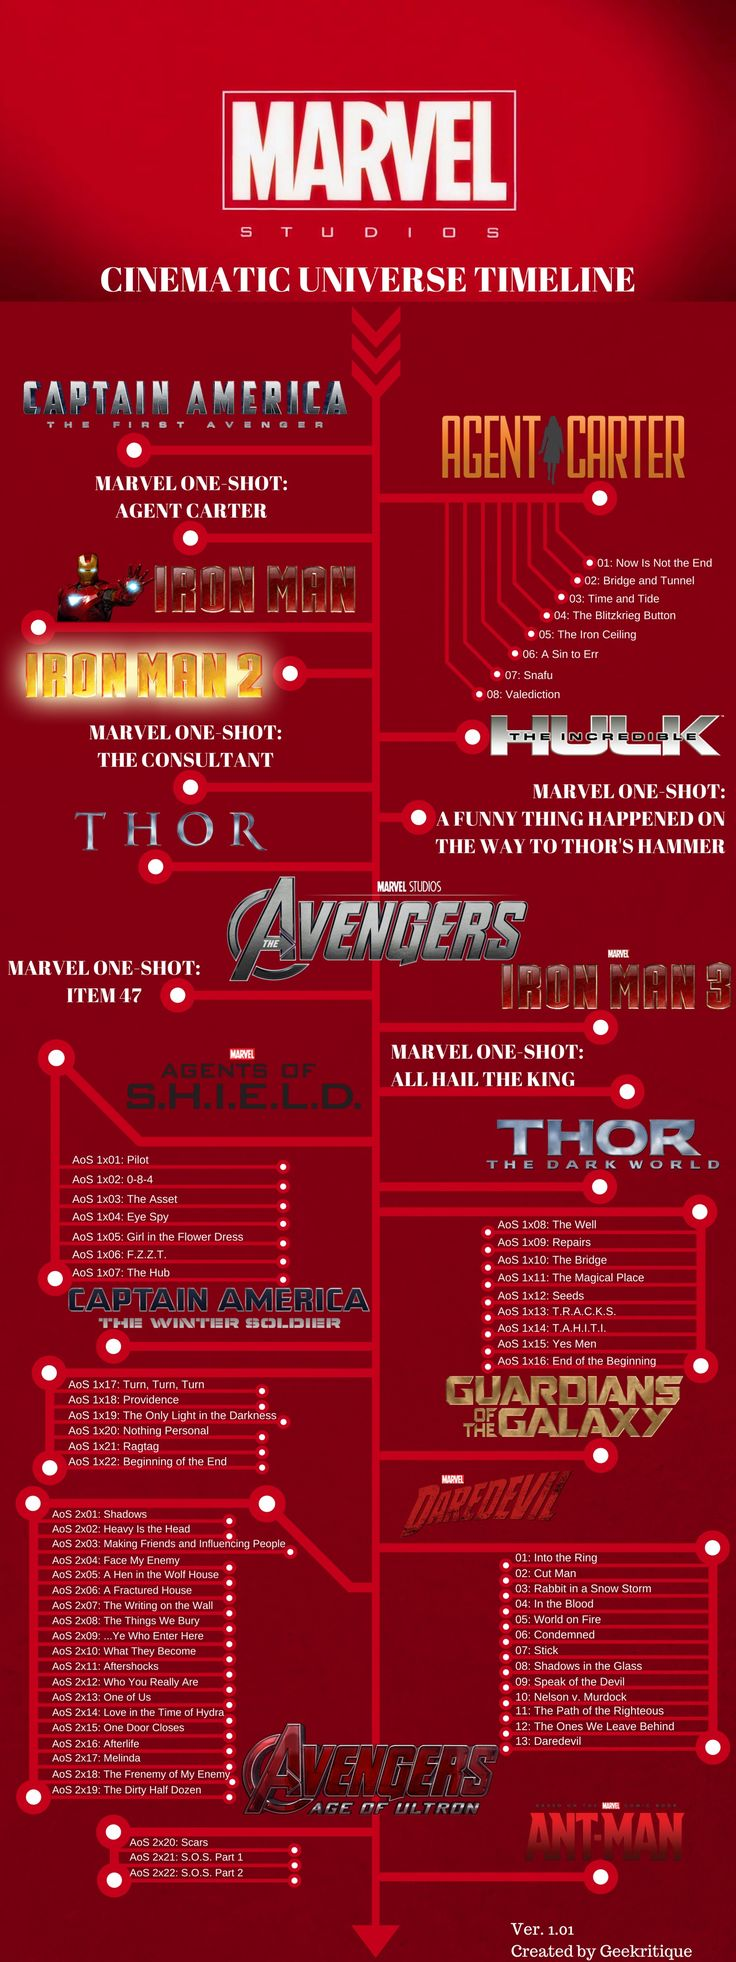 The Marvel Cinematic Universe Chronological Timeline